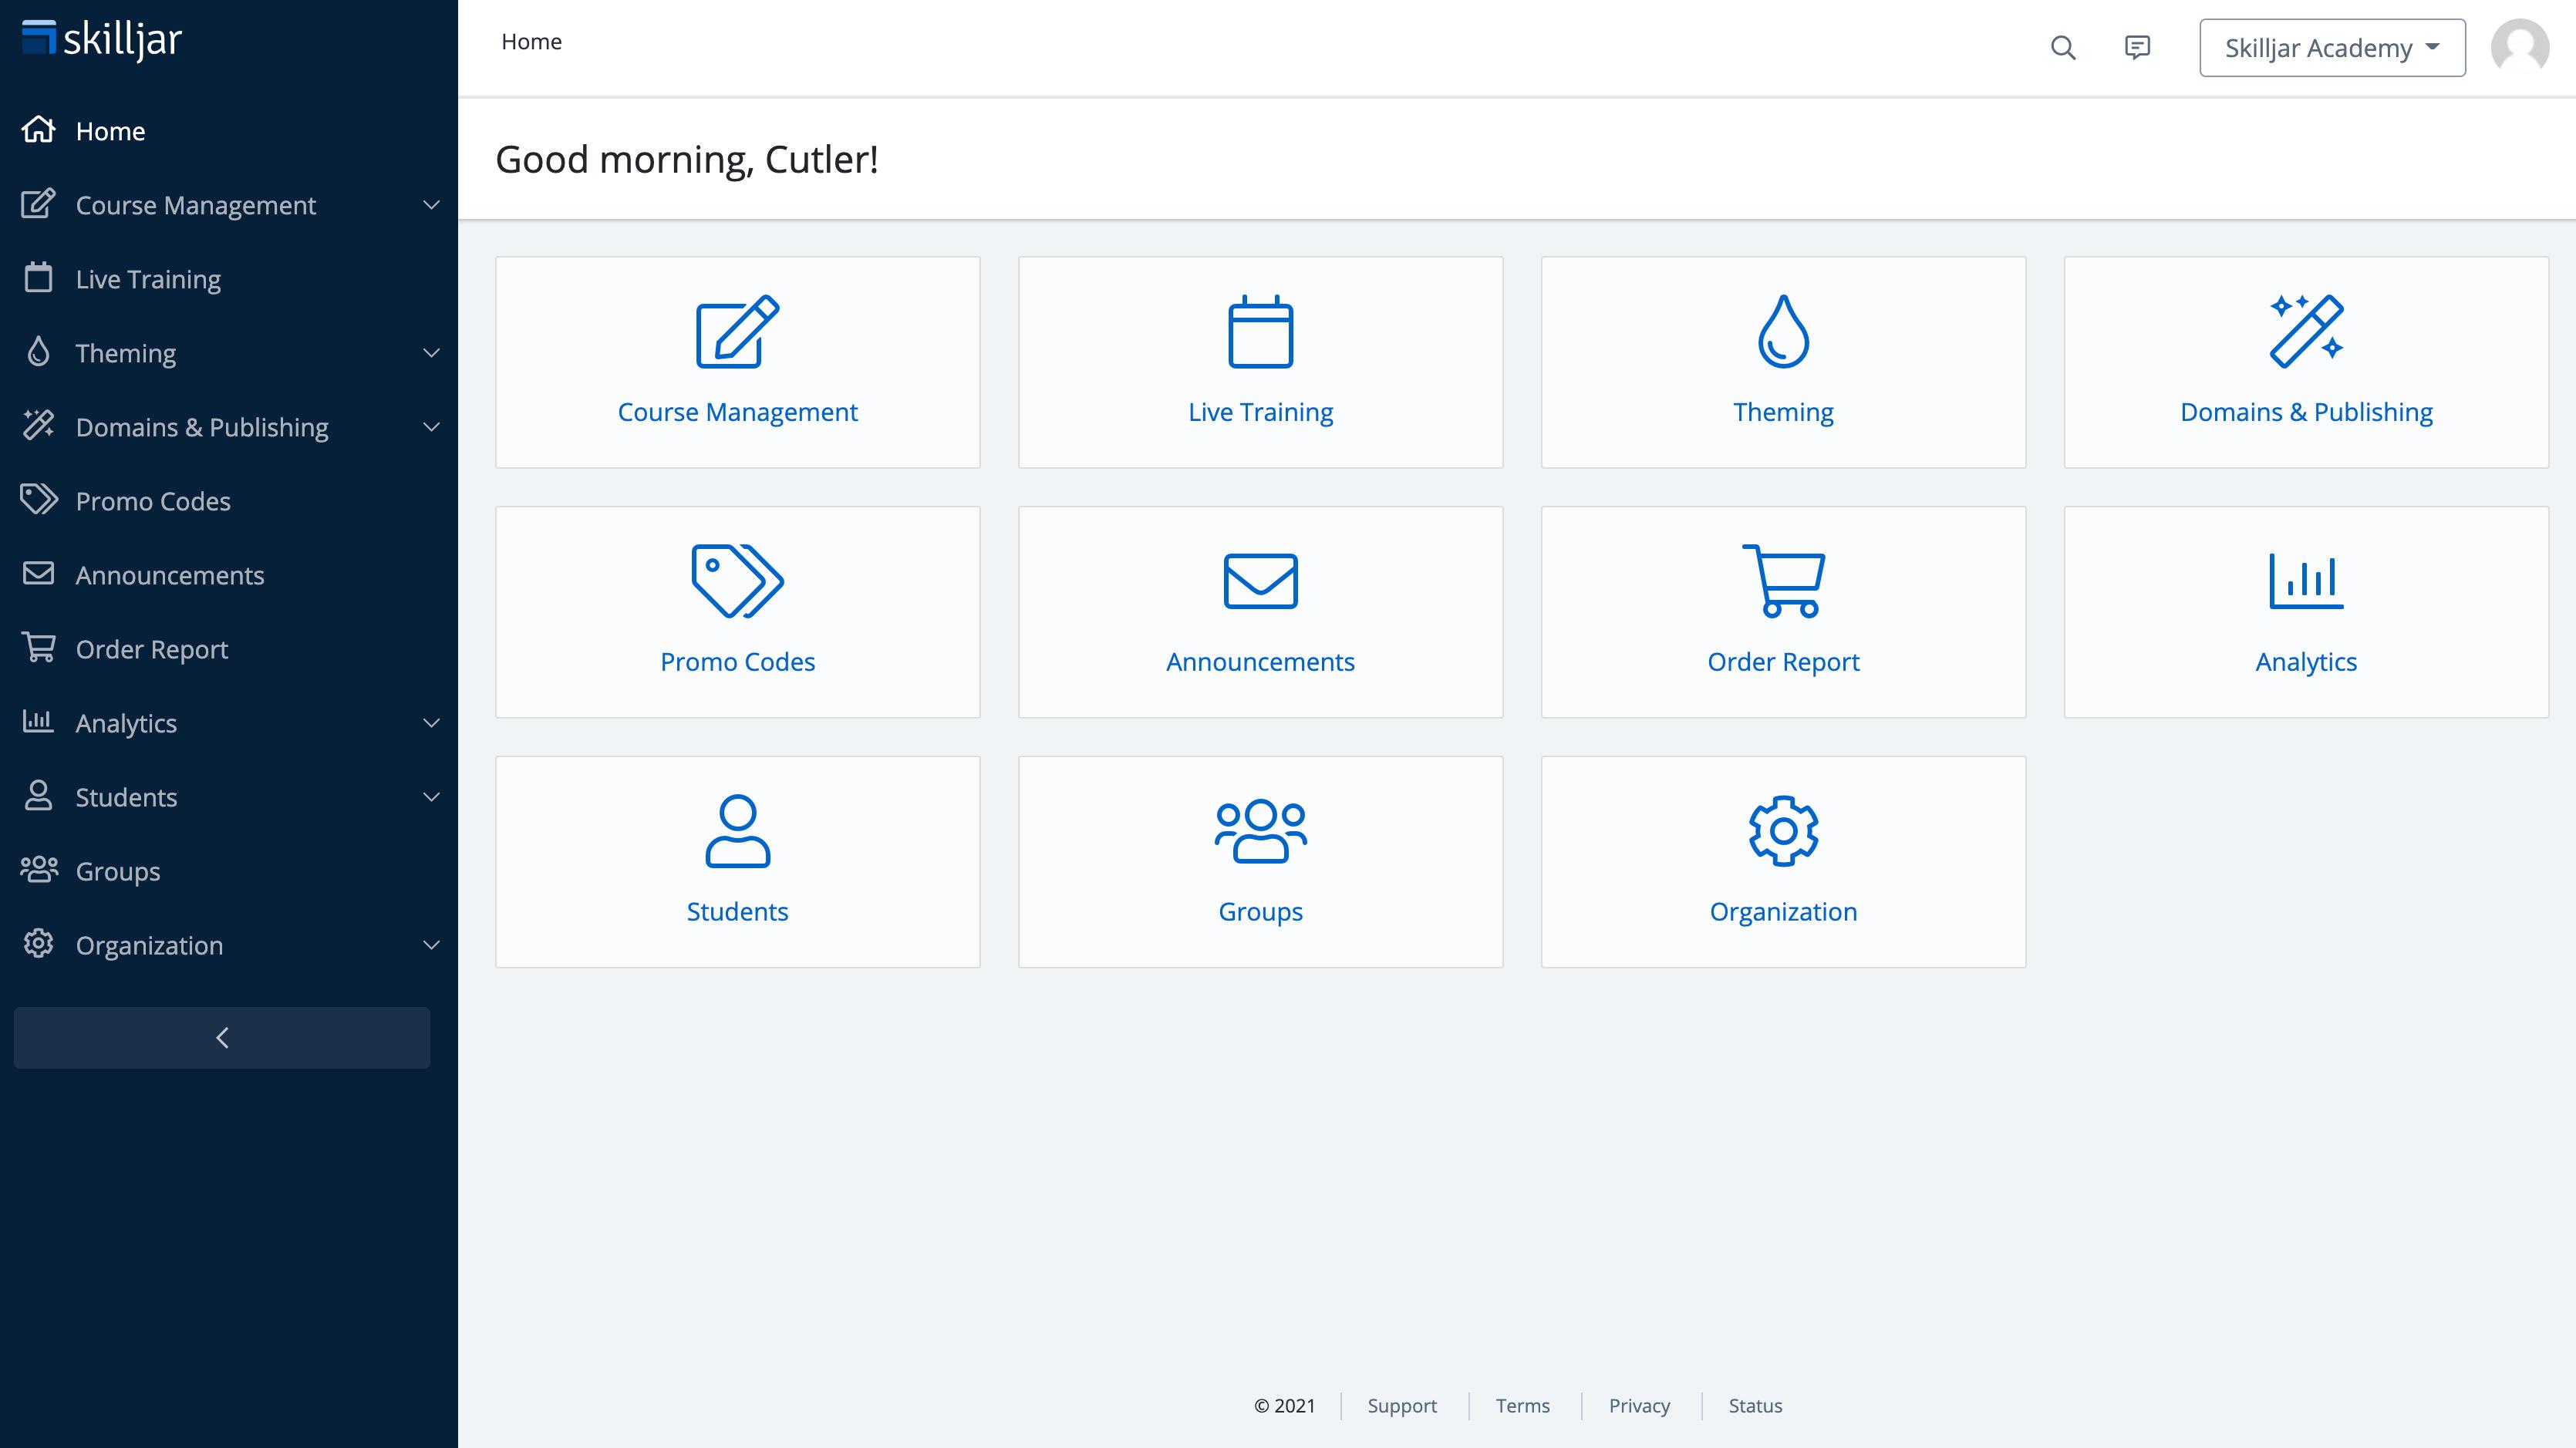 Skilljar Customer Education Software - Skilljar